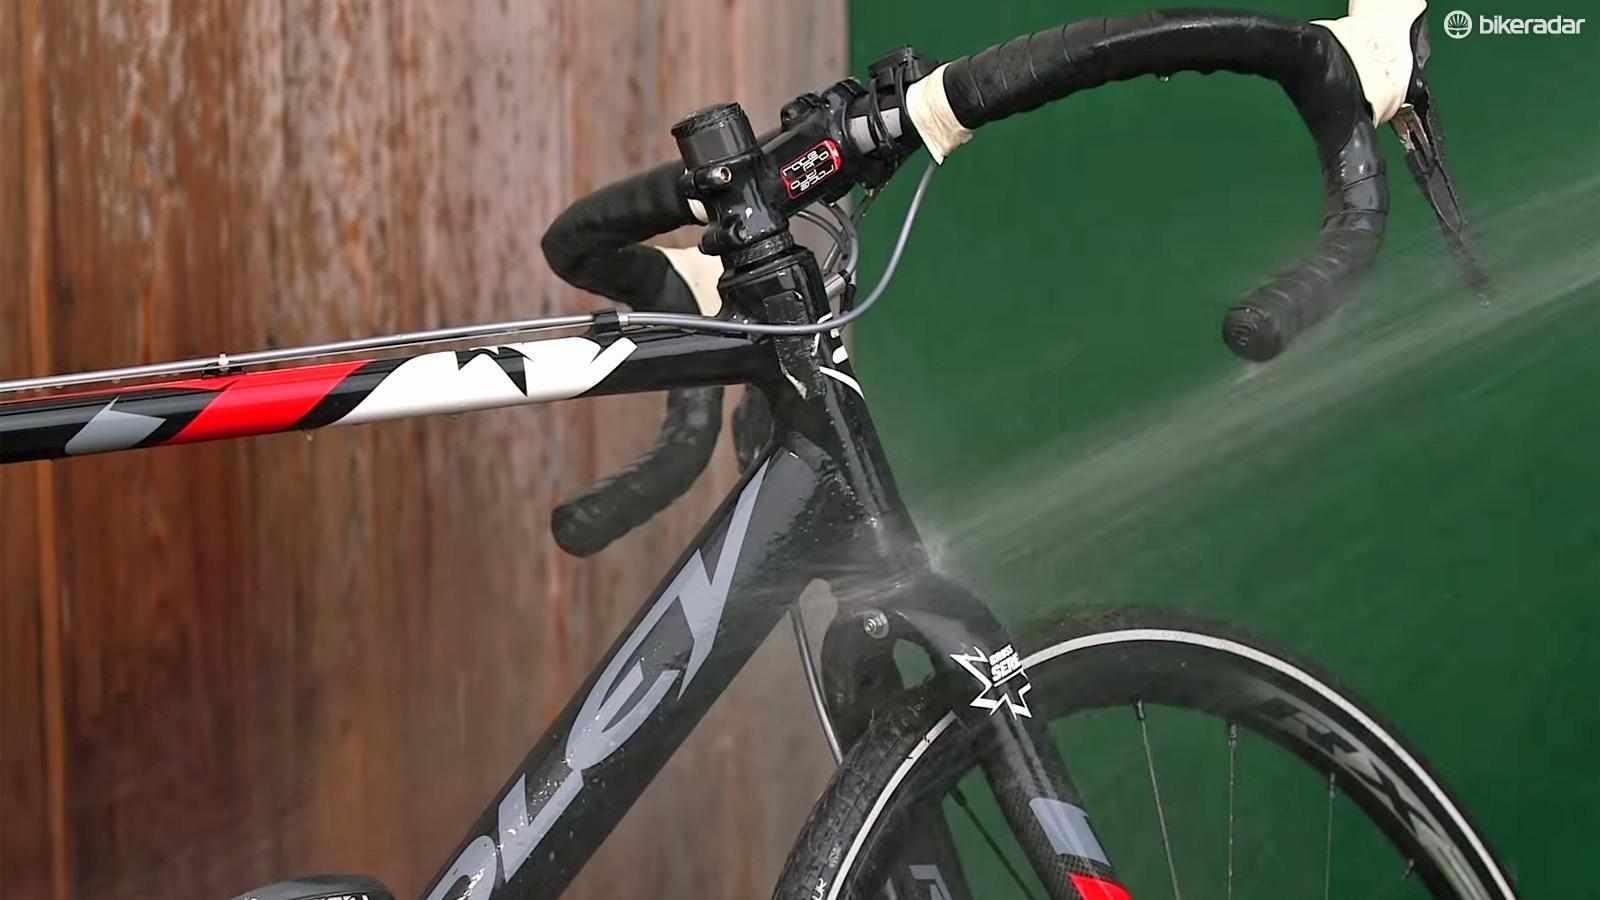 How to jet-wash a bike